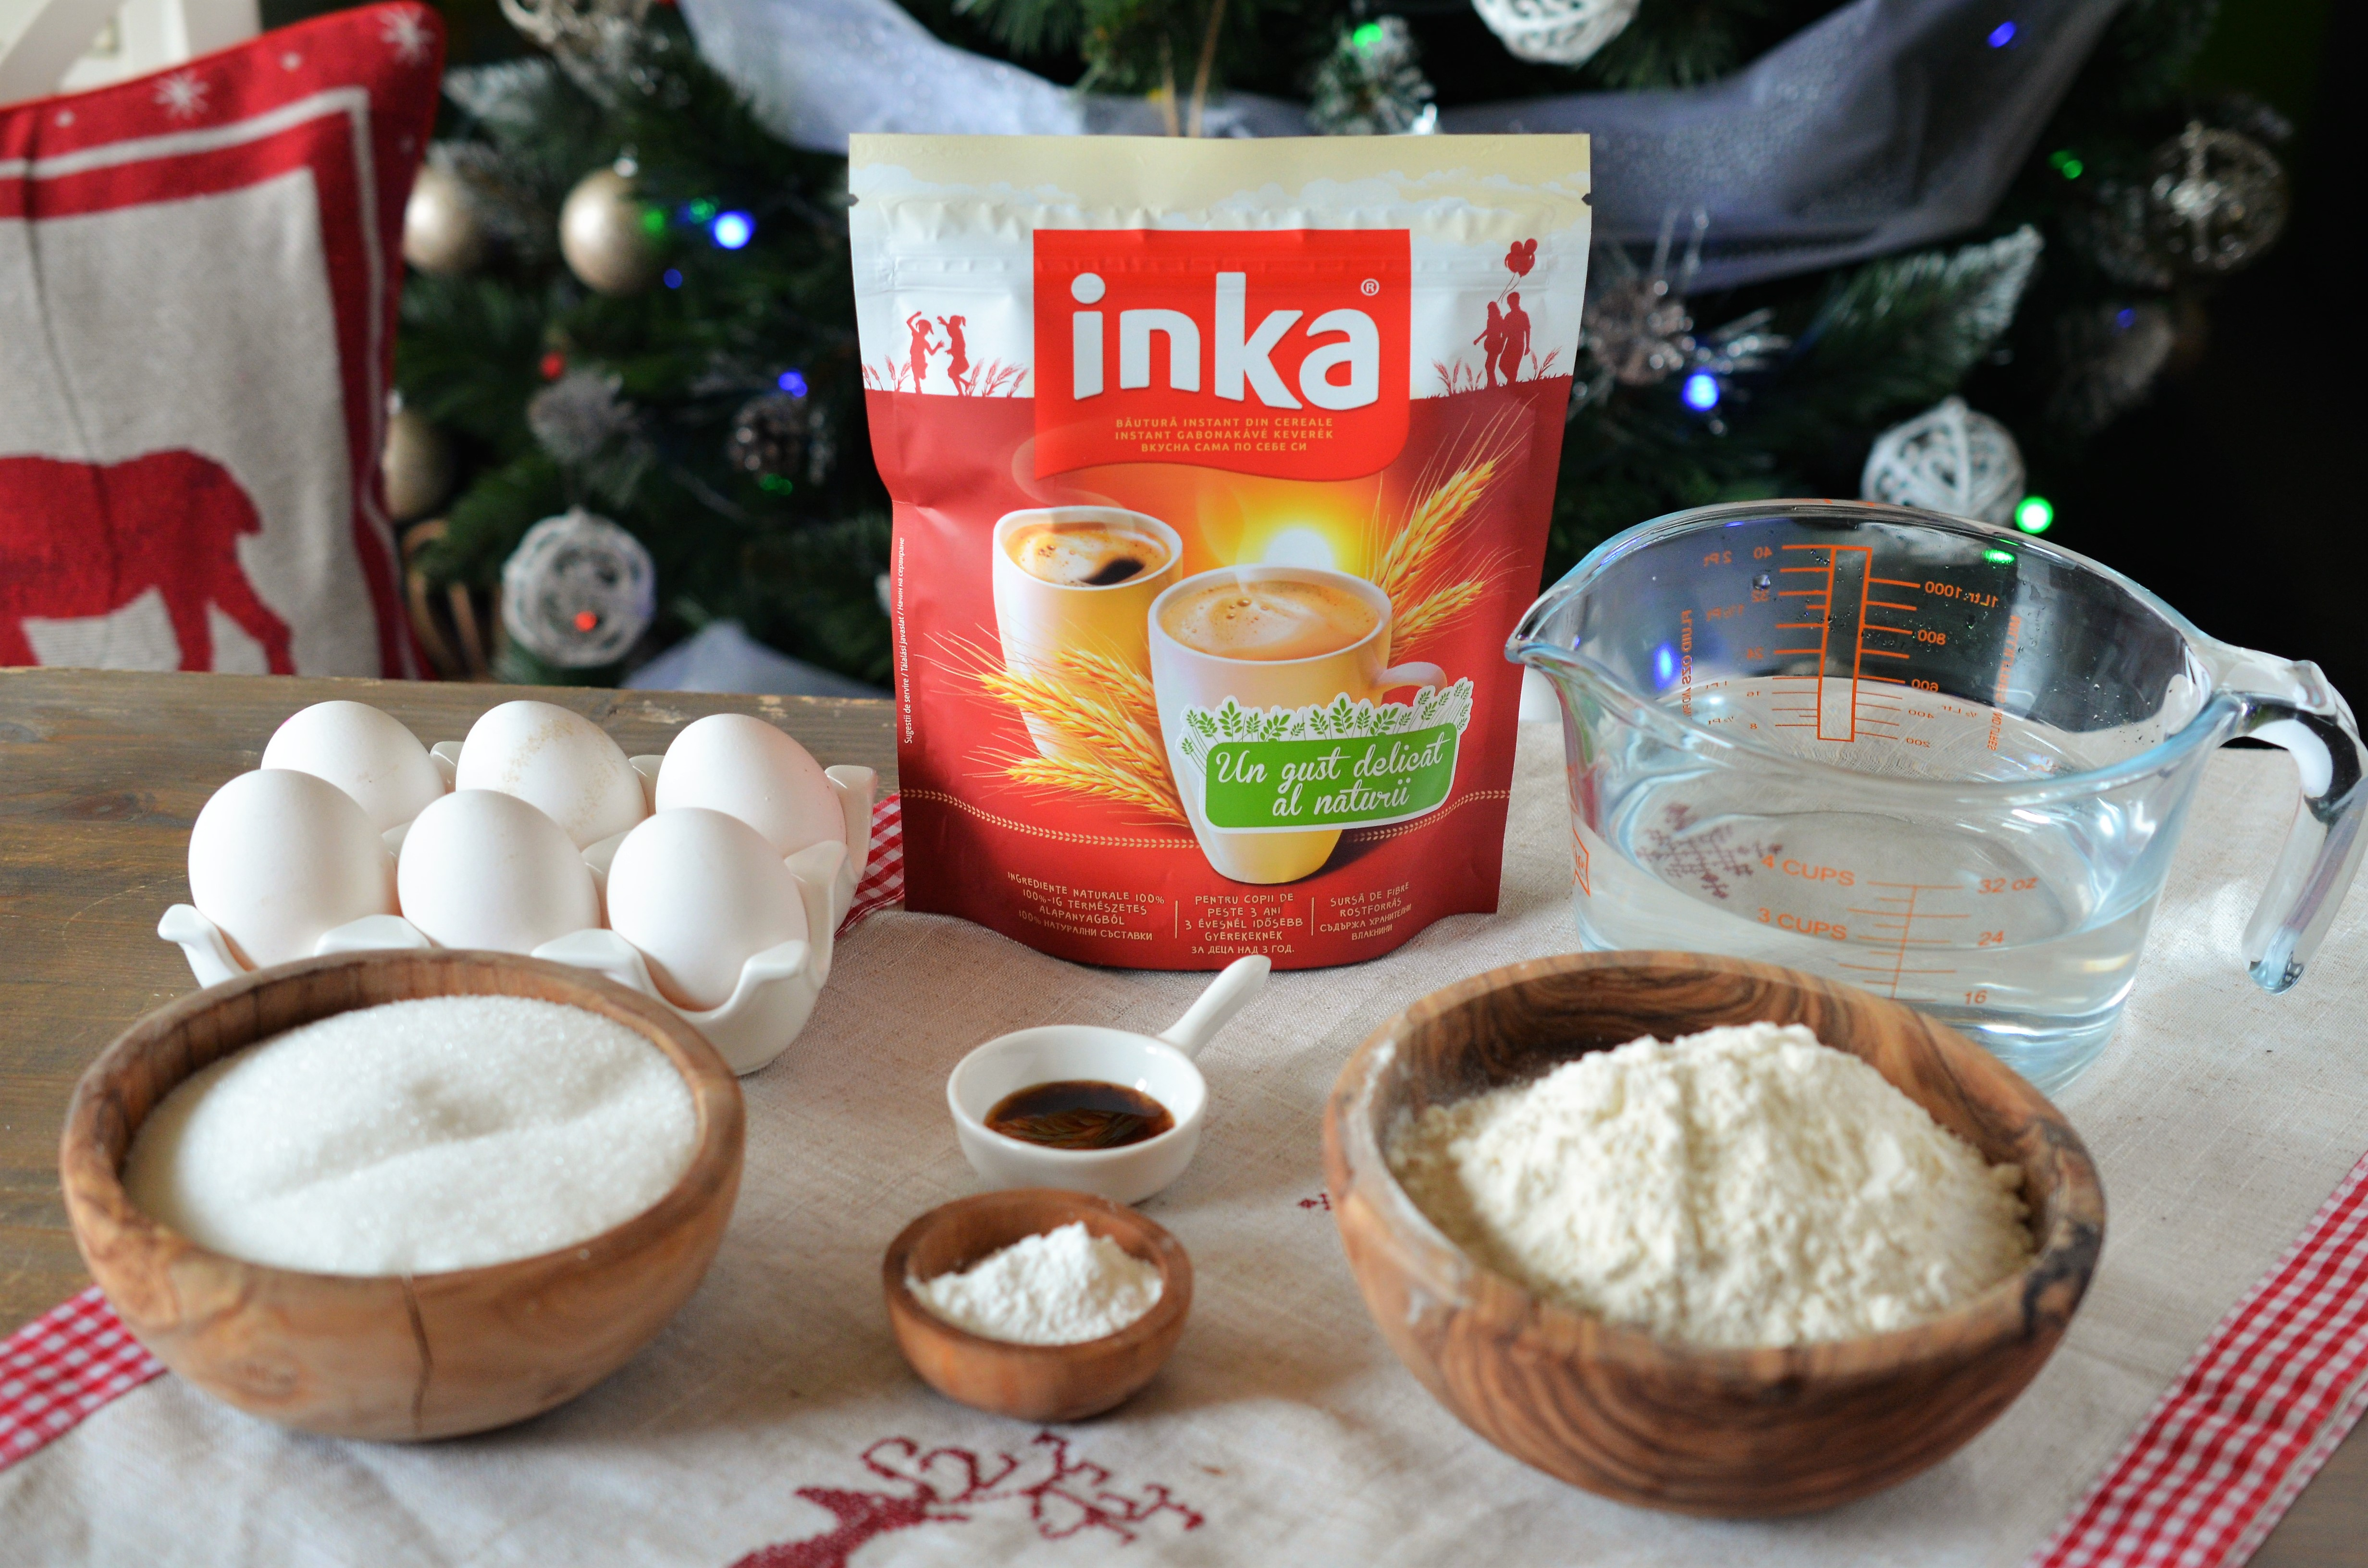 prajitura cu inka